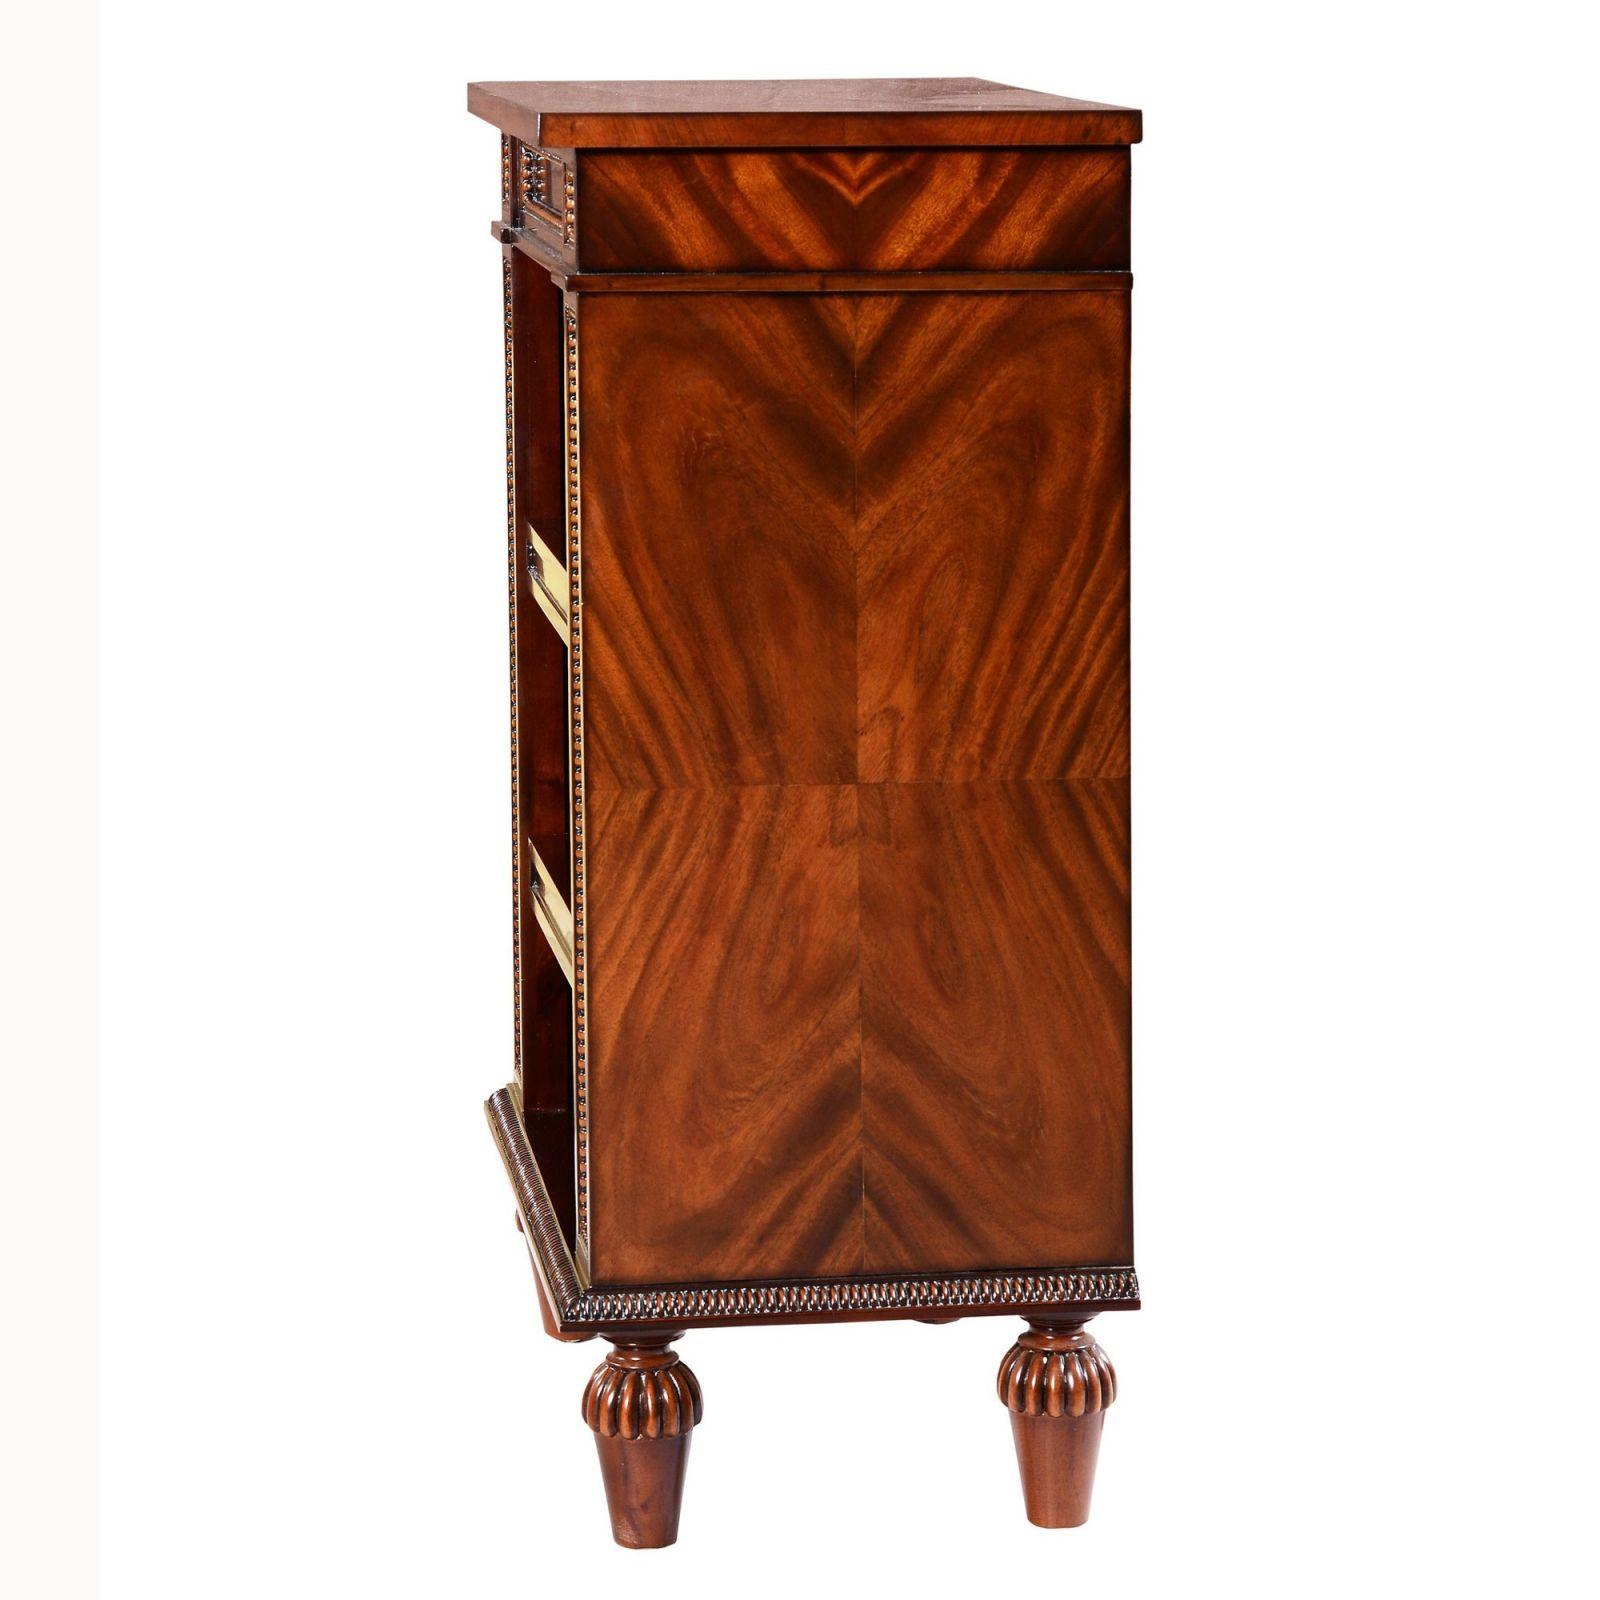 Regency Style Mahogany open Bookcase - 24in